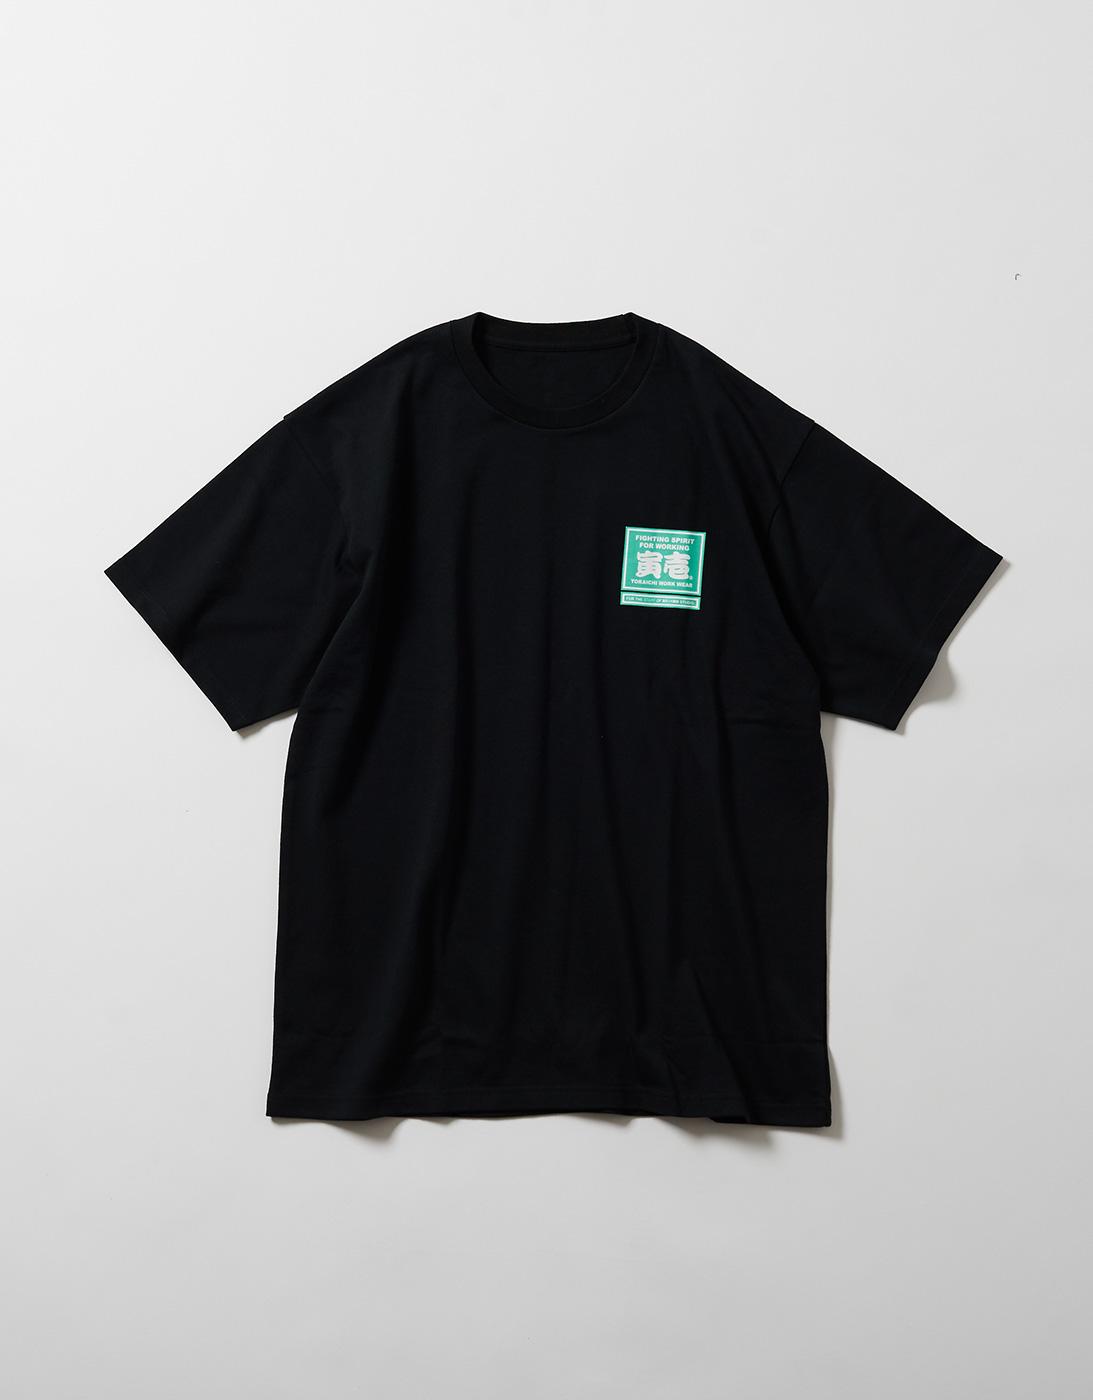 TORA LOGO WORK T-shirts for THE STAFF of ARSHAM STUDIO 1807-618 BLACK